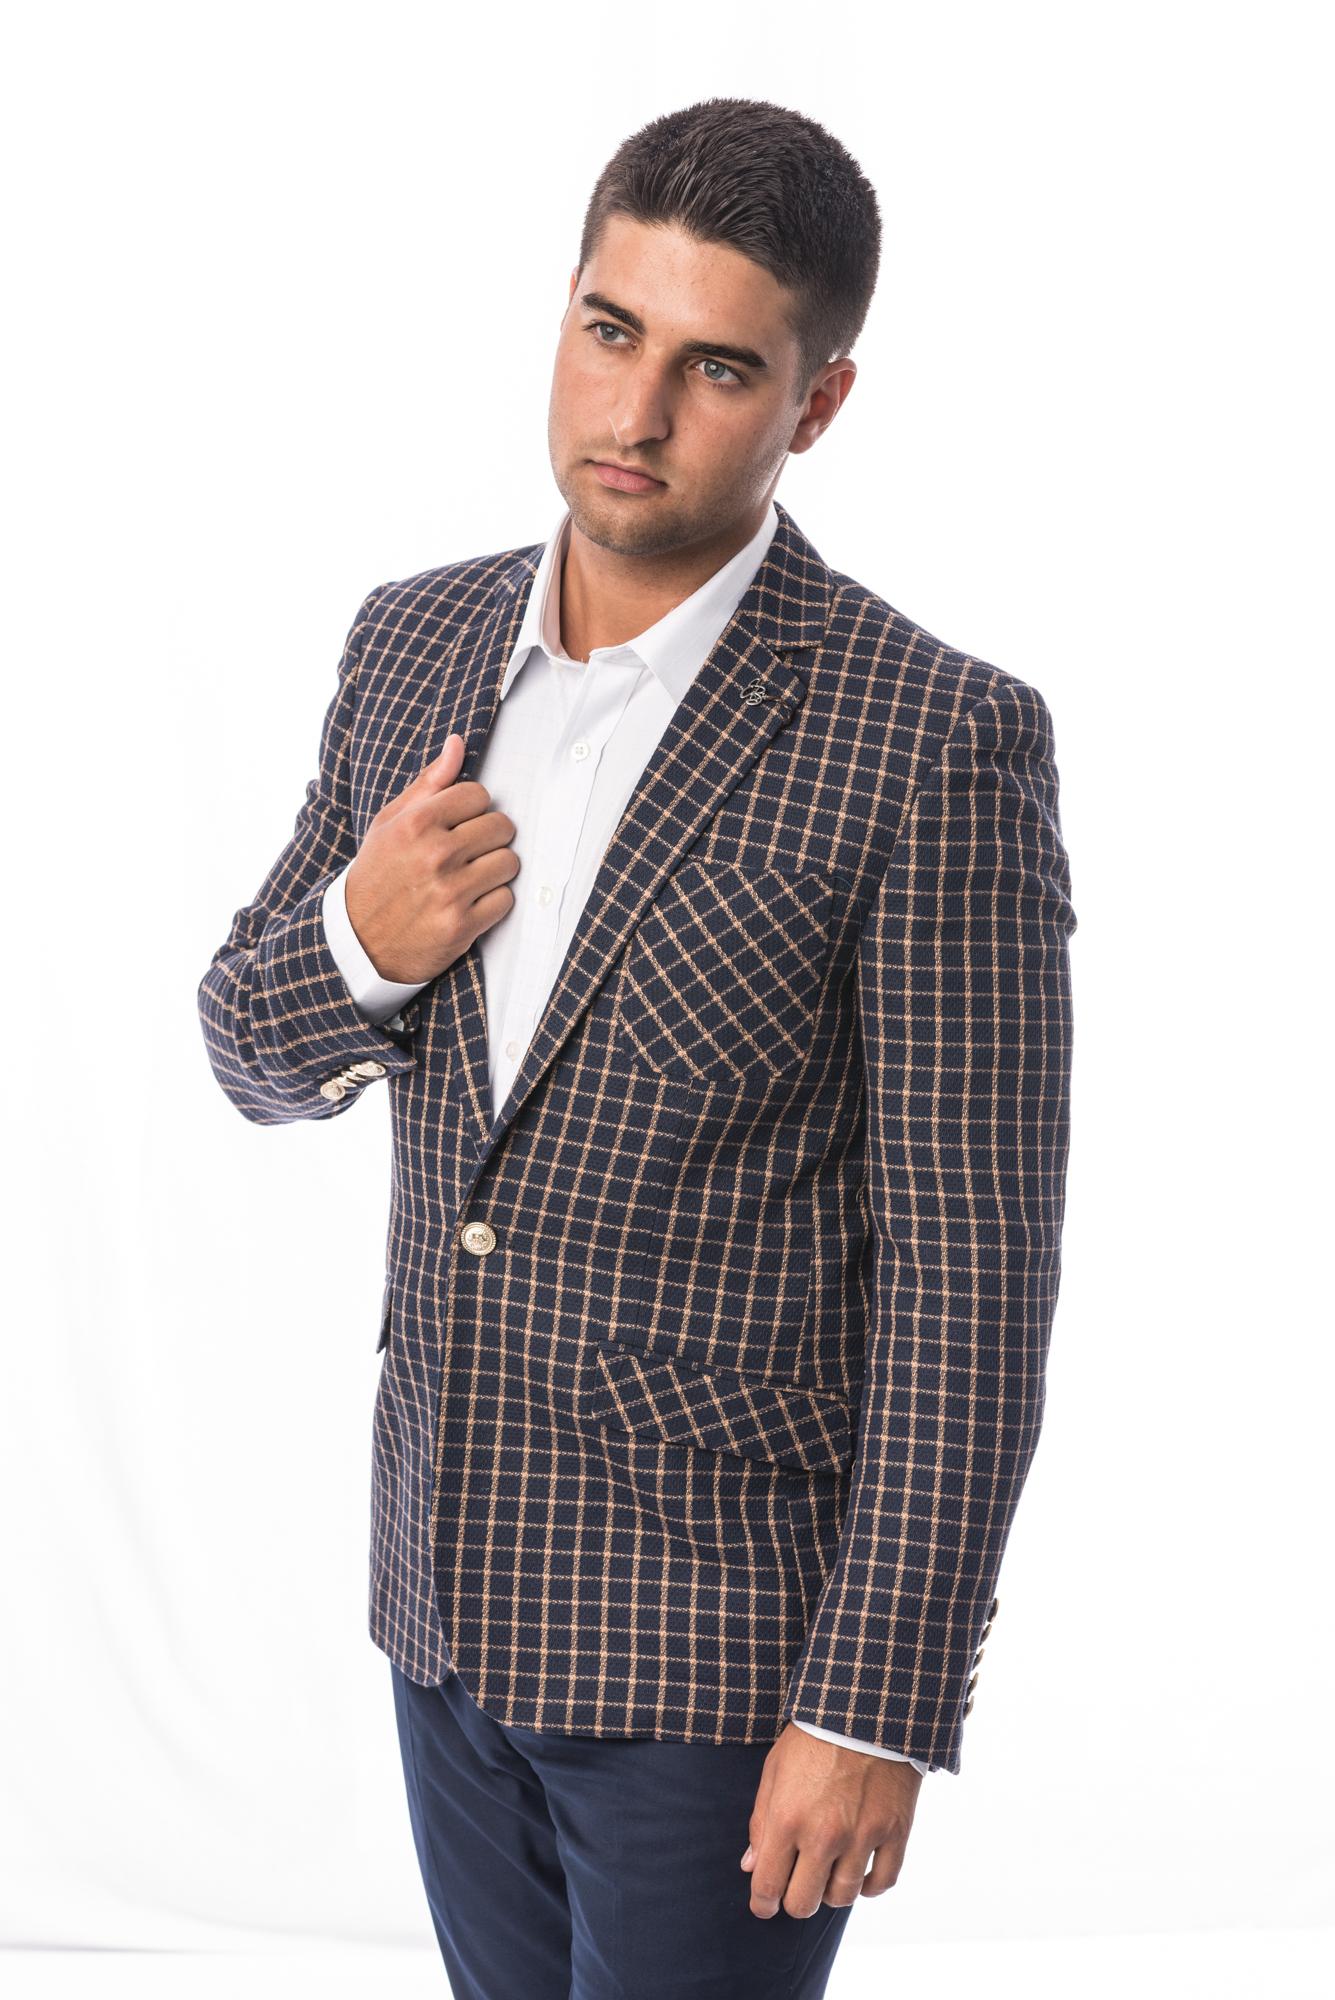 Small Check Design Men Blazers / Sports Coat Jacket EBBS1684M